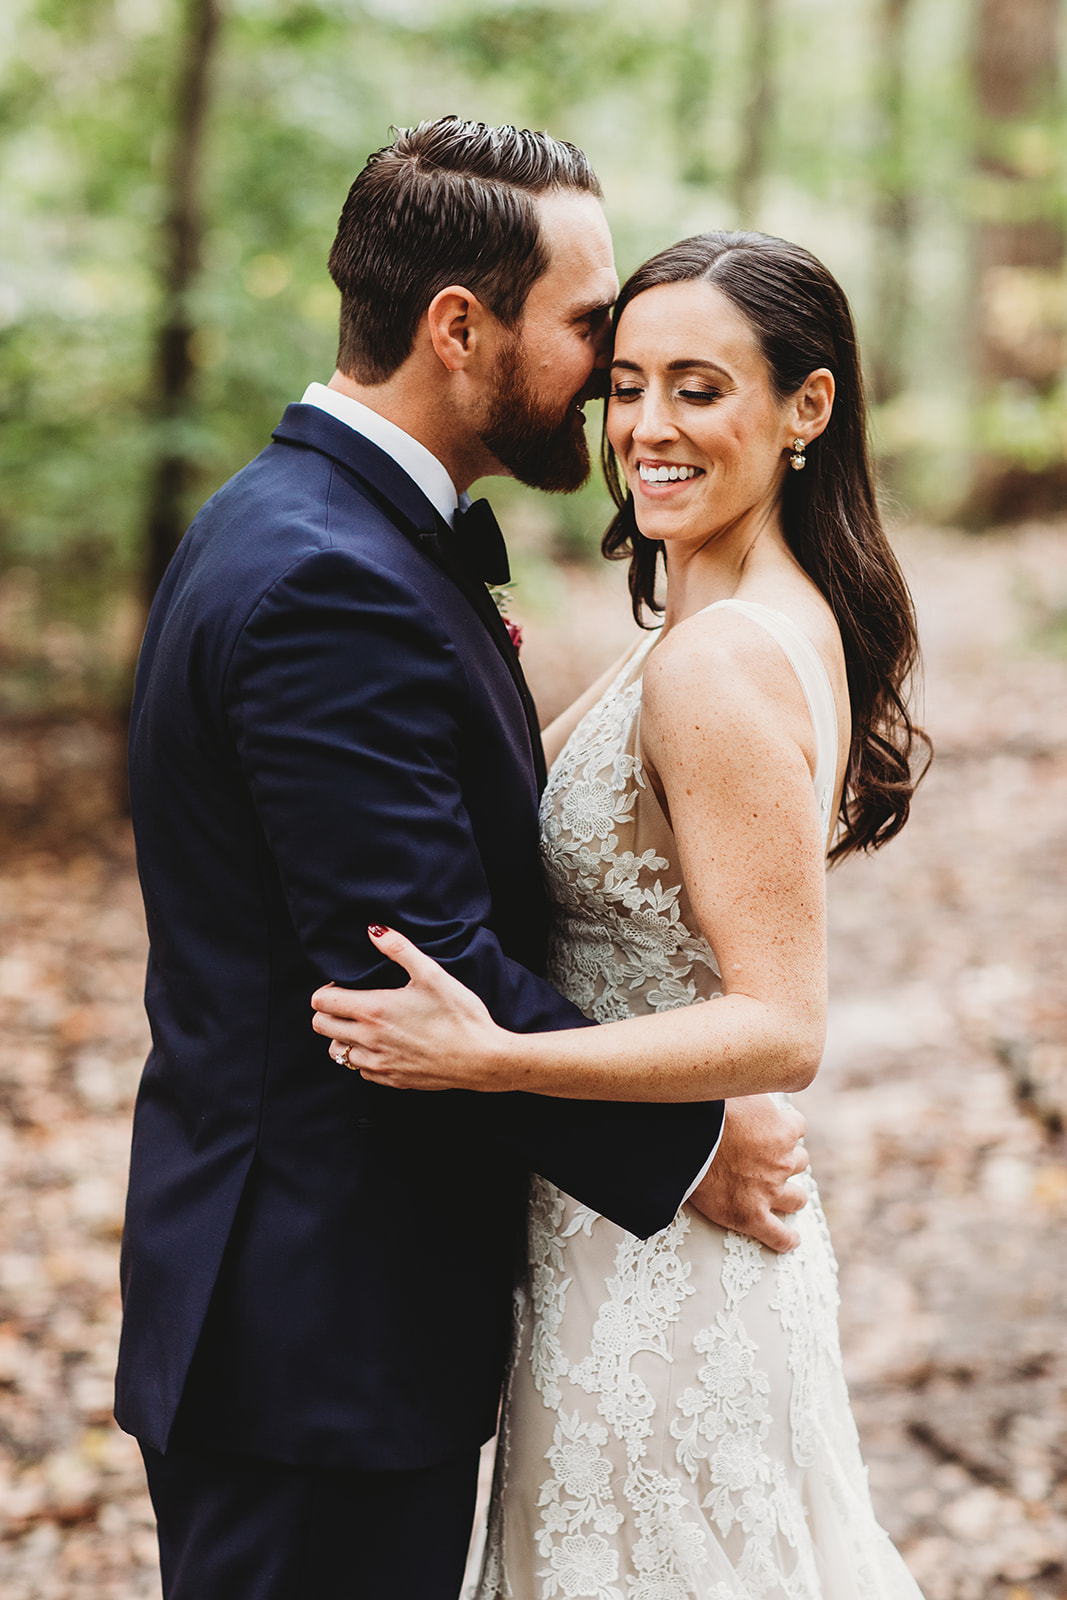 Ryan-Zarichnak-Photography-Pittsburgh-Susan-Evan-Wedding-1813.jpg